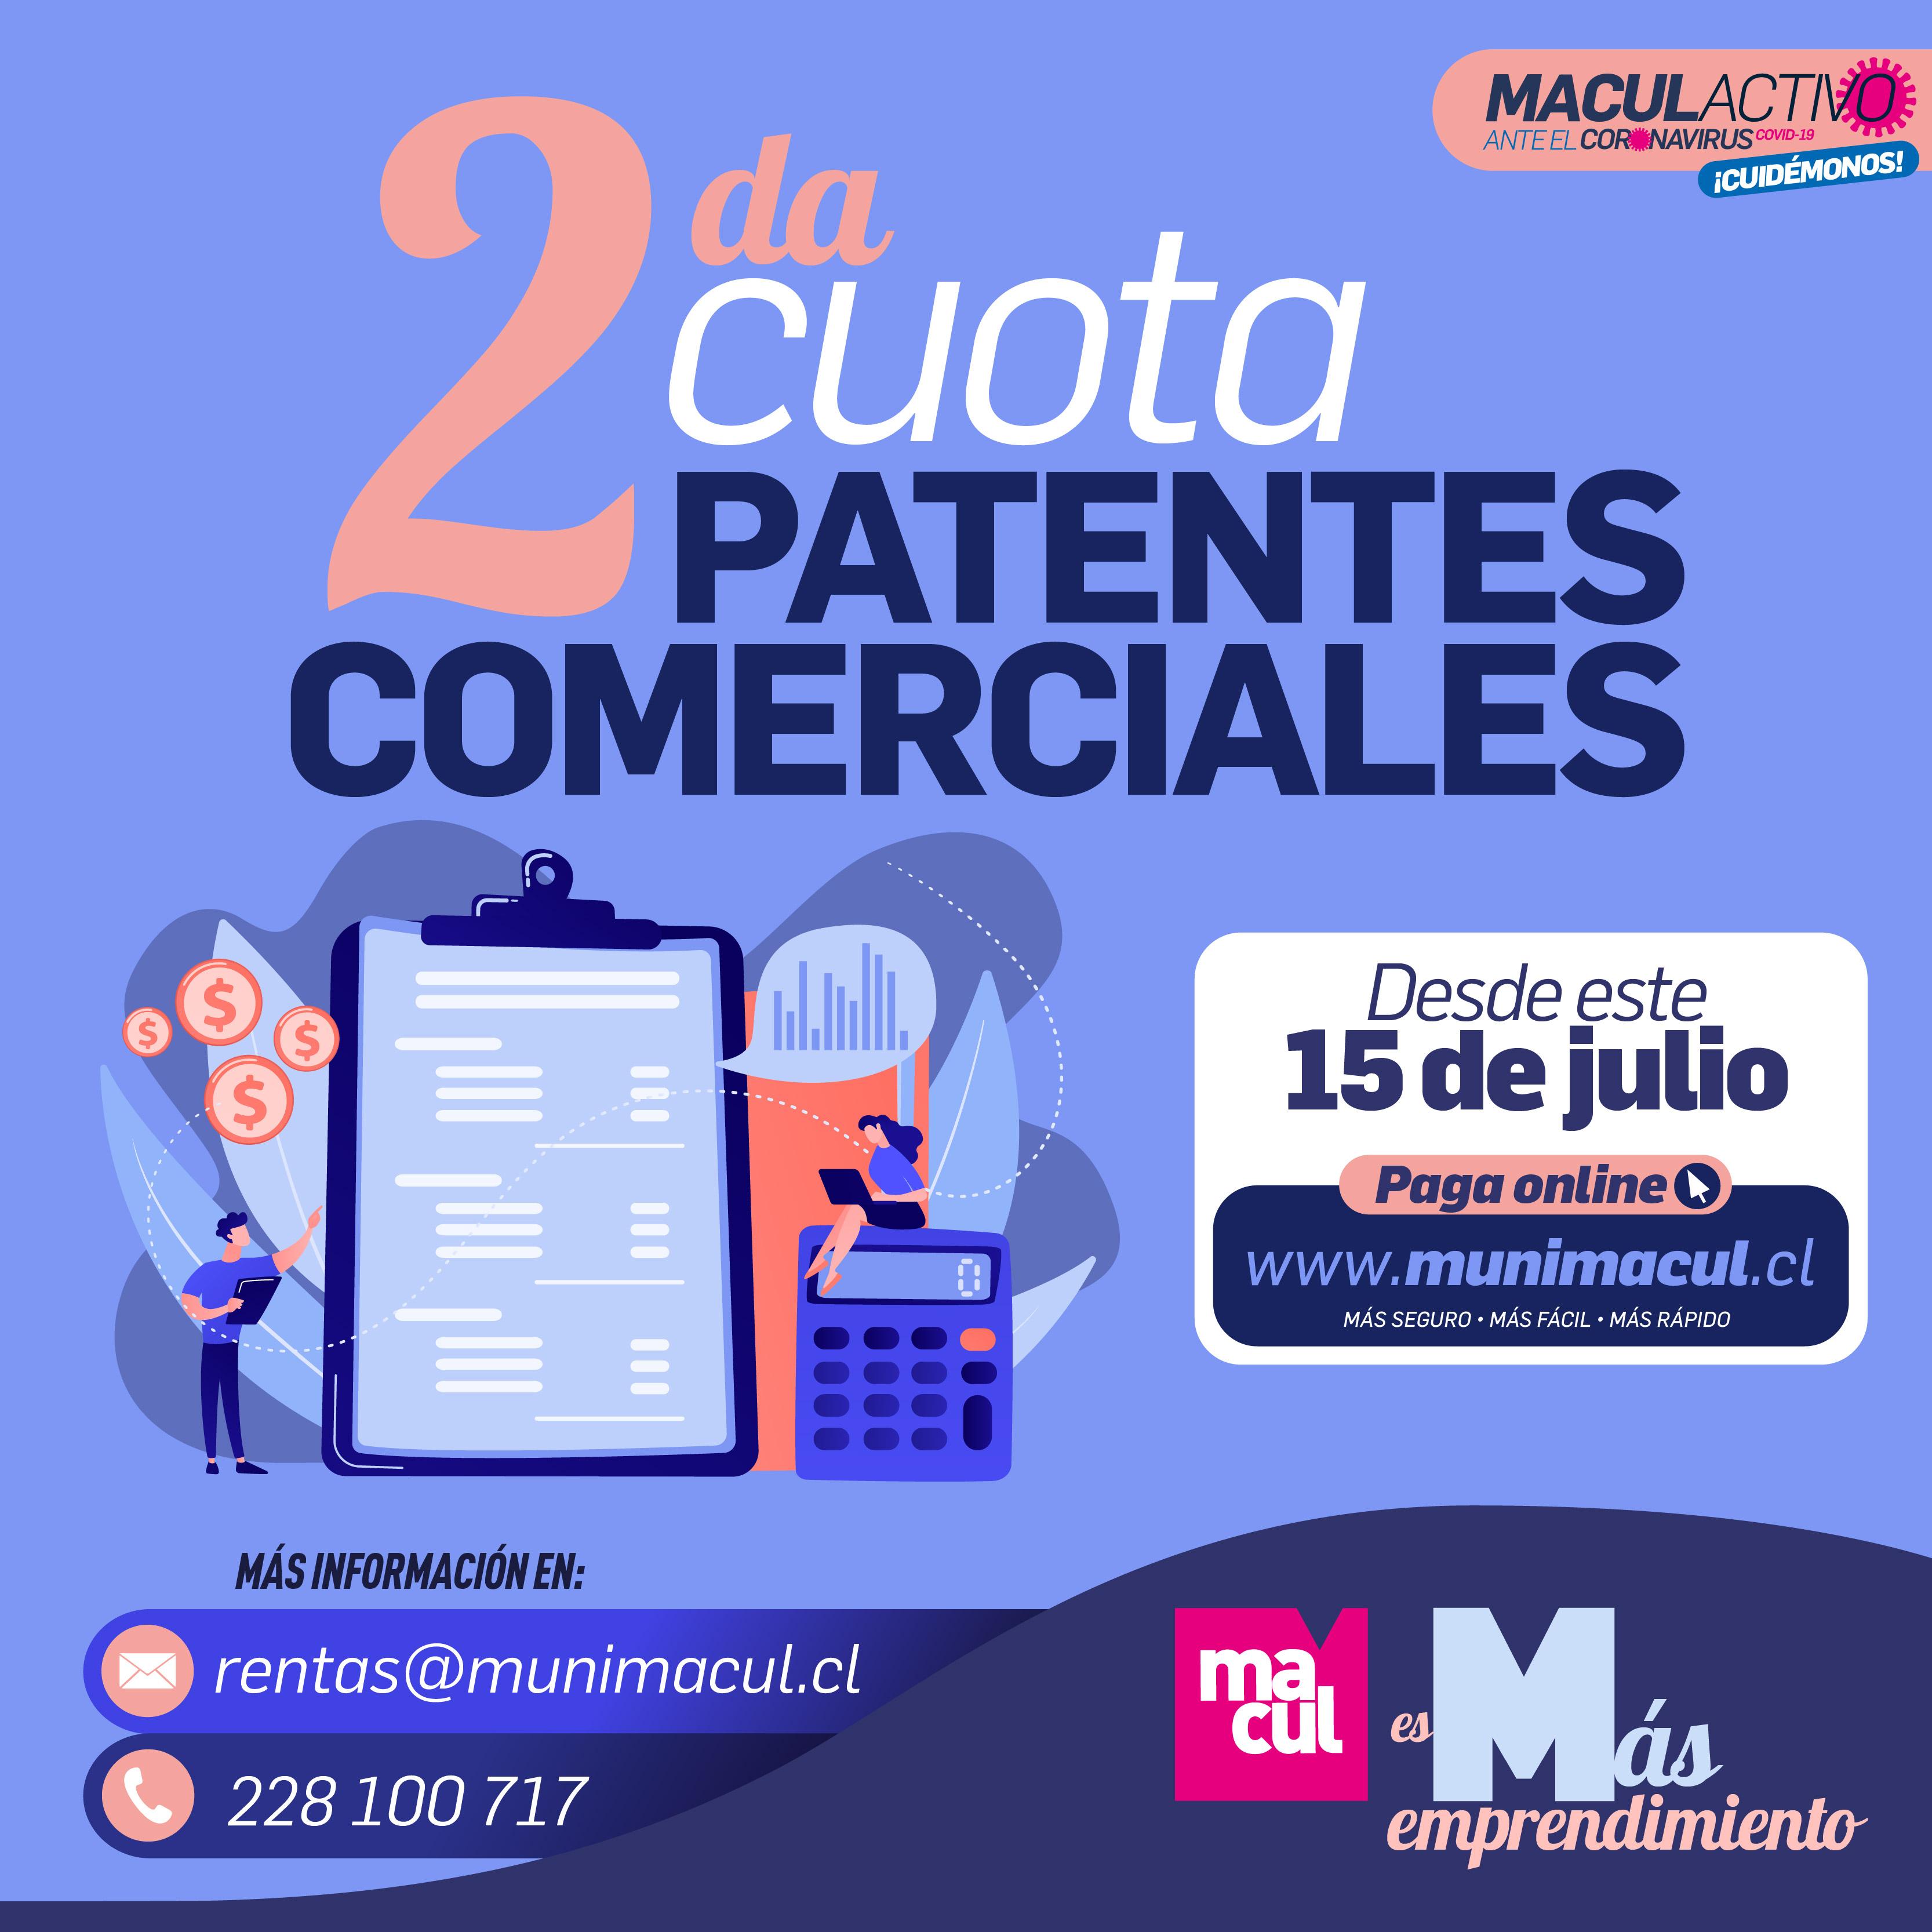 _POST 2ª CUOTA PATENTES COMERCIALES-01